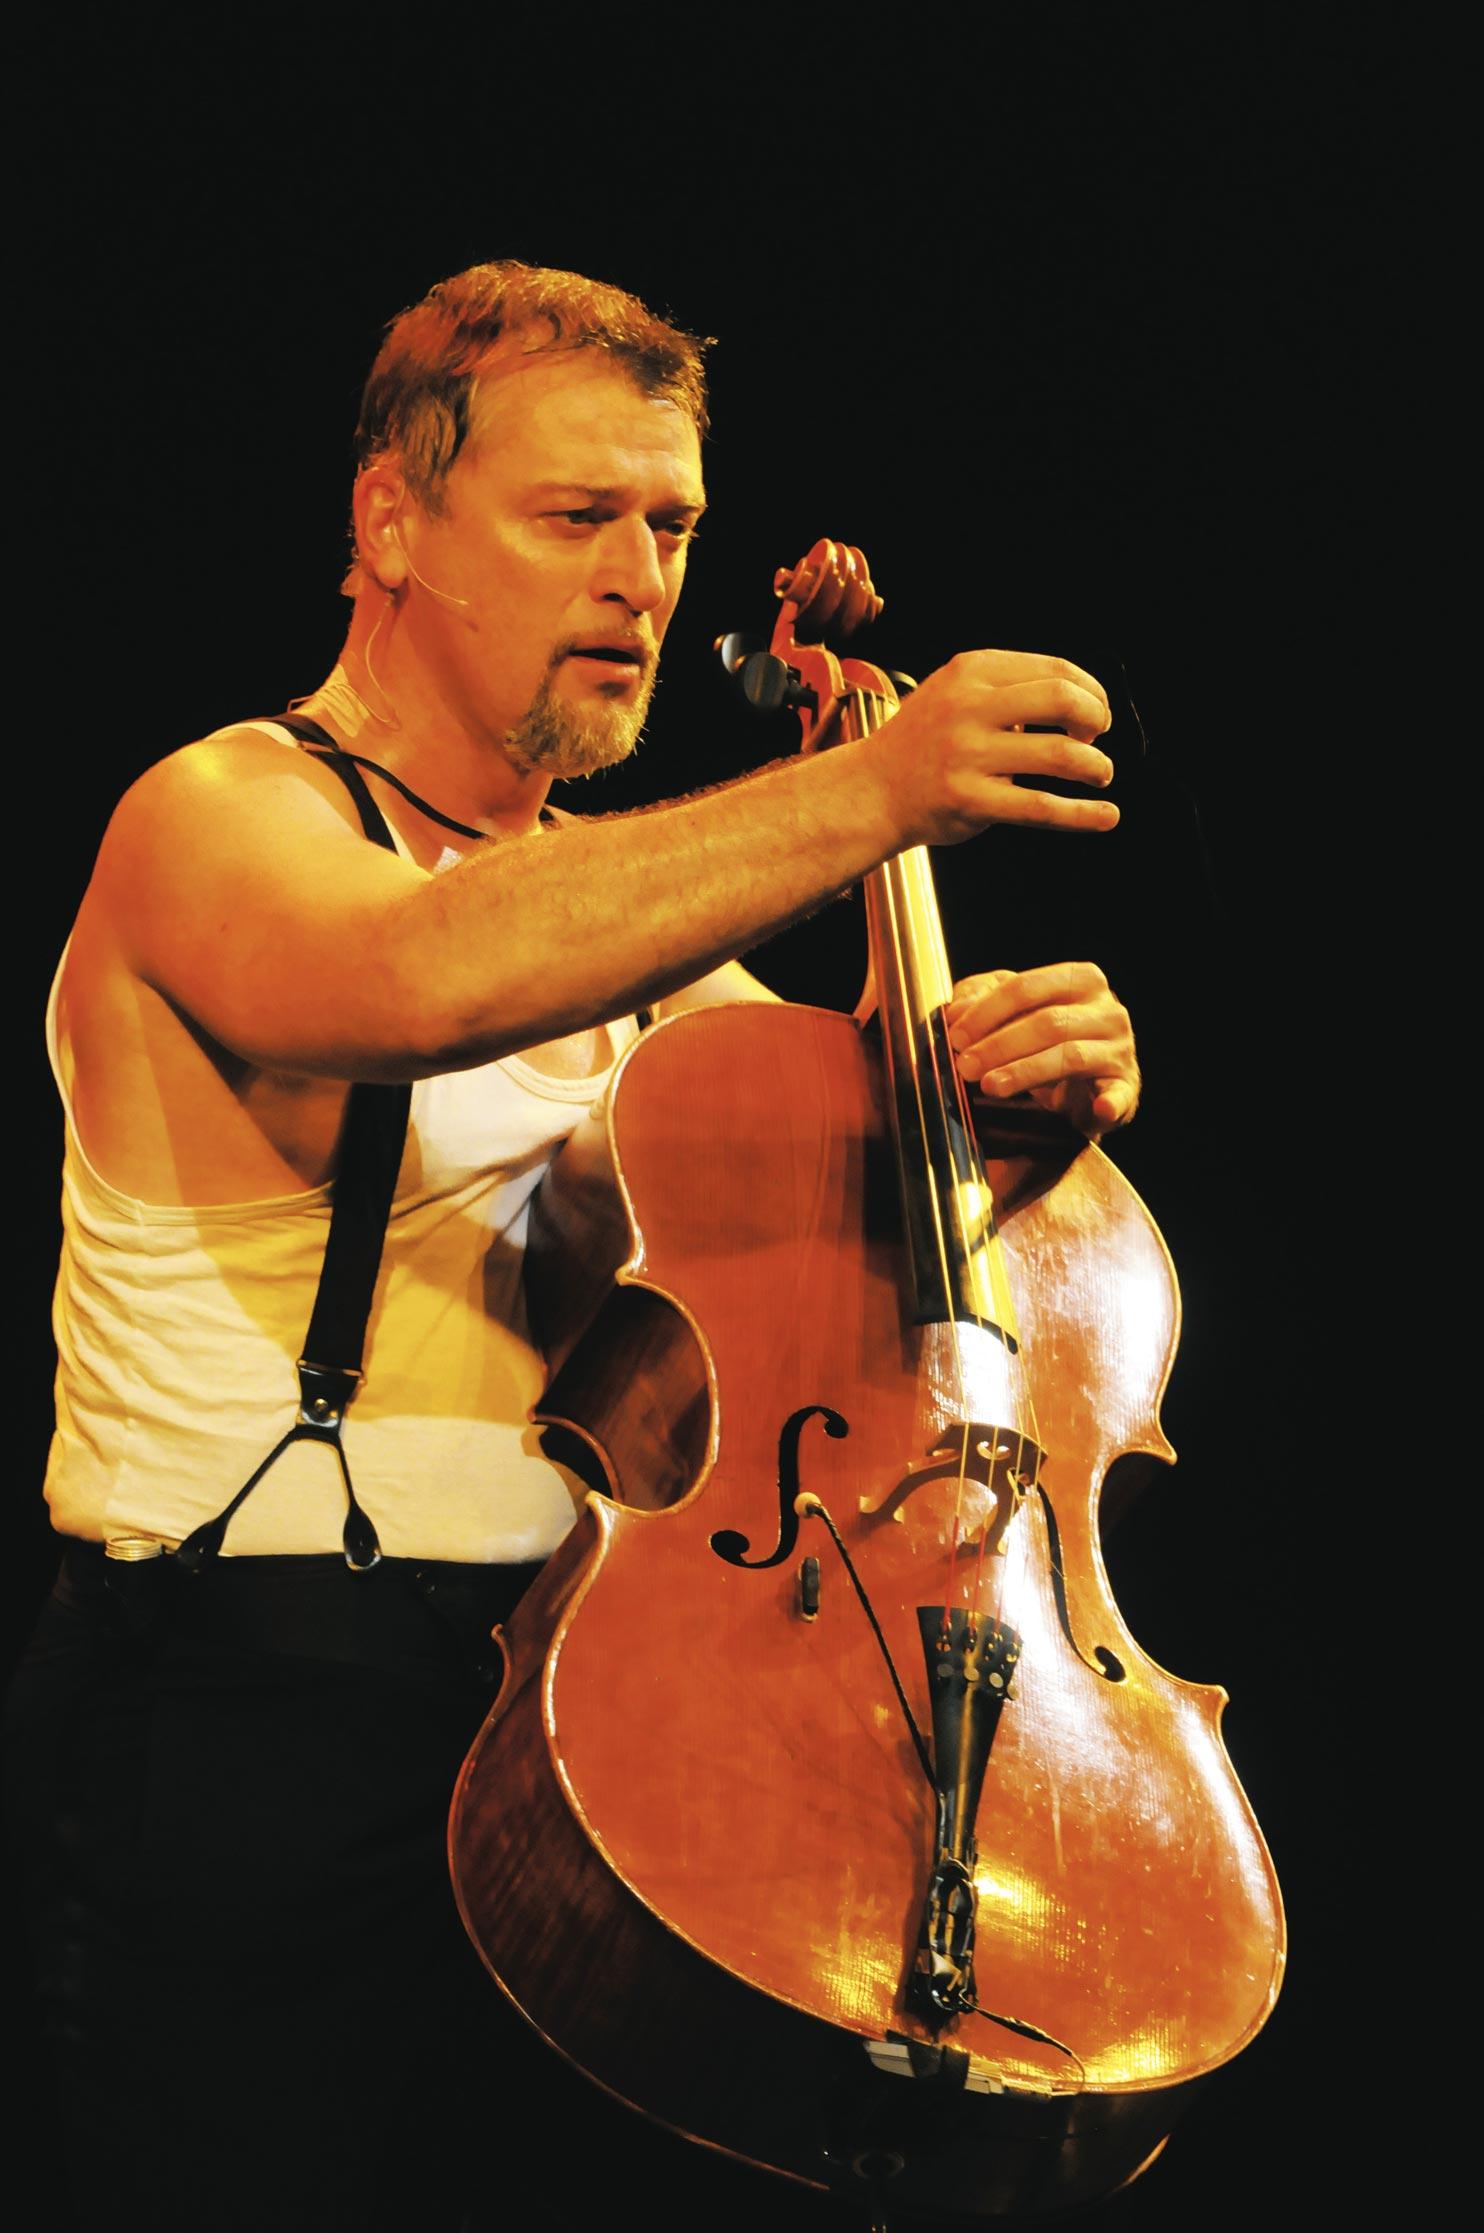 Laurent Cirade